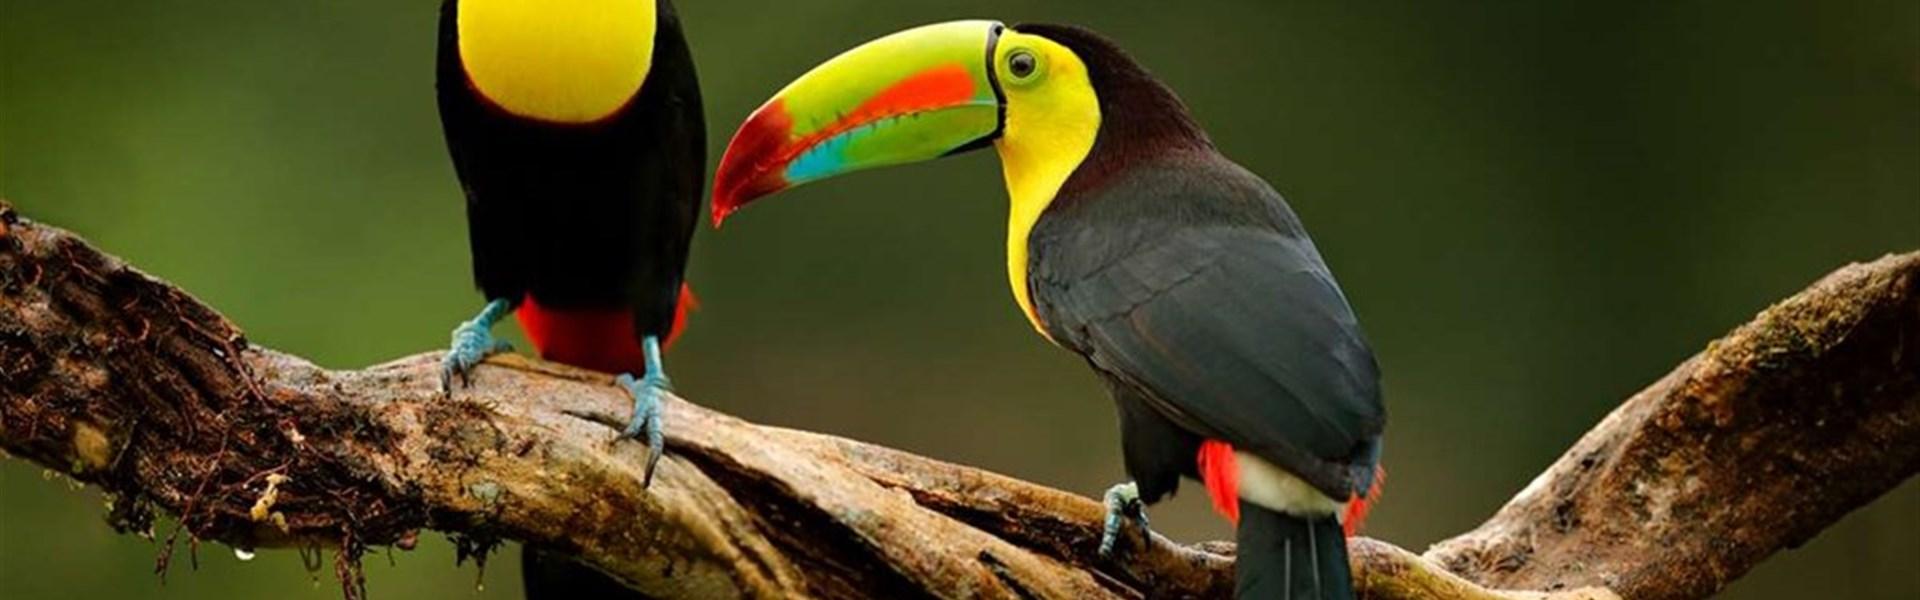 Kostarická odysea - od Pacifiku ke Karibiku -